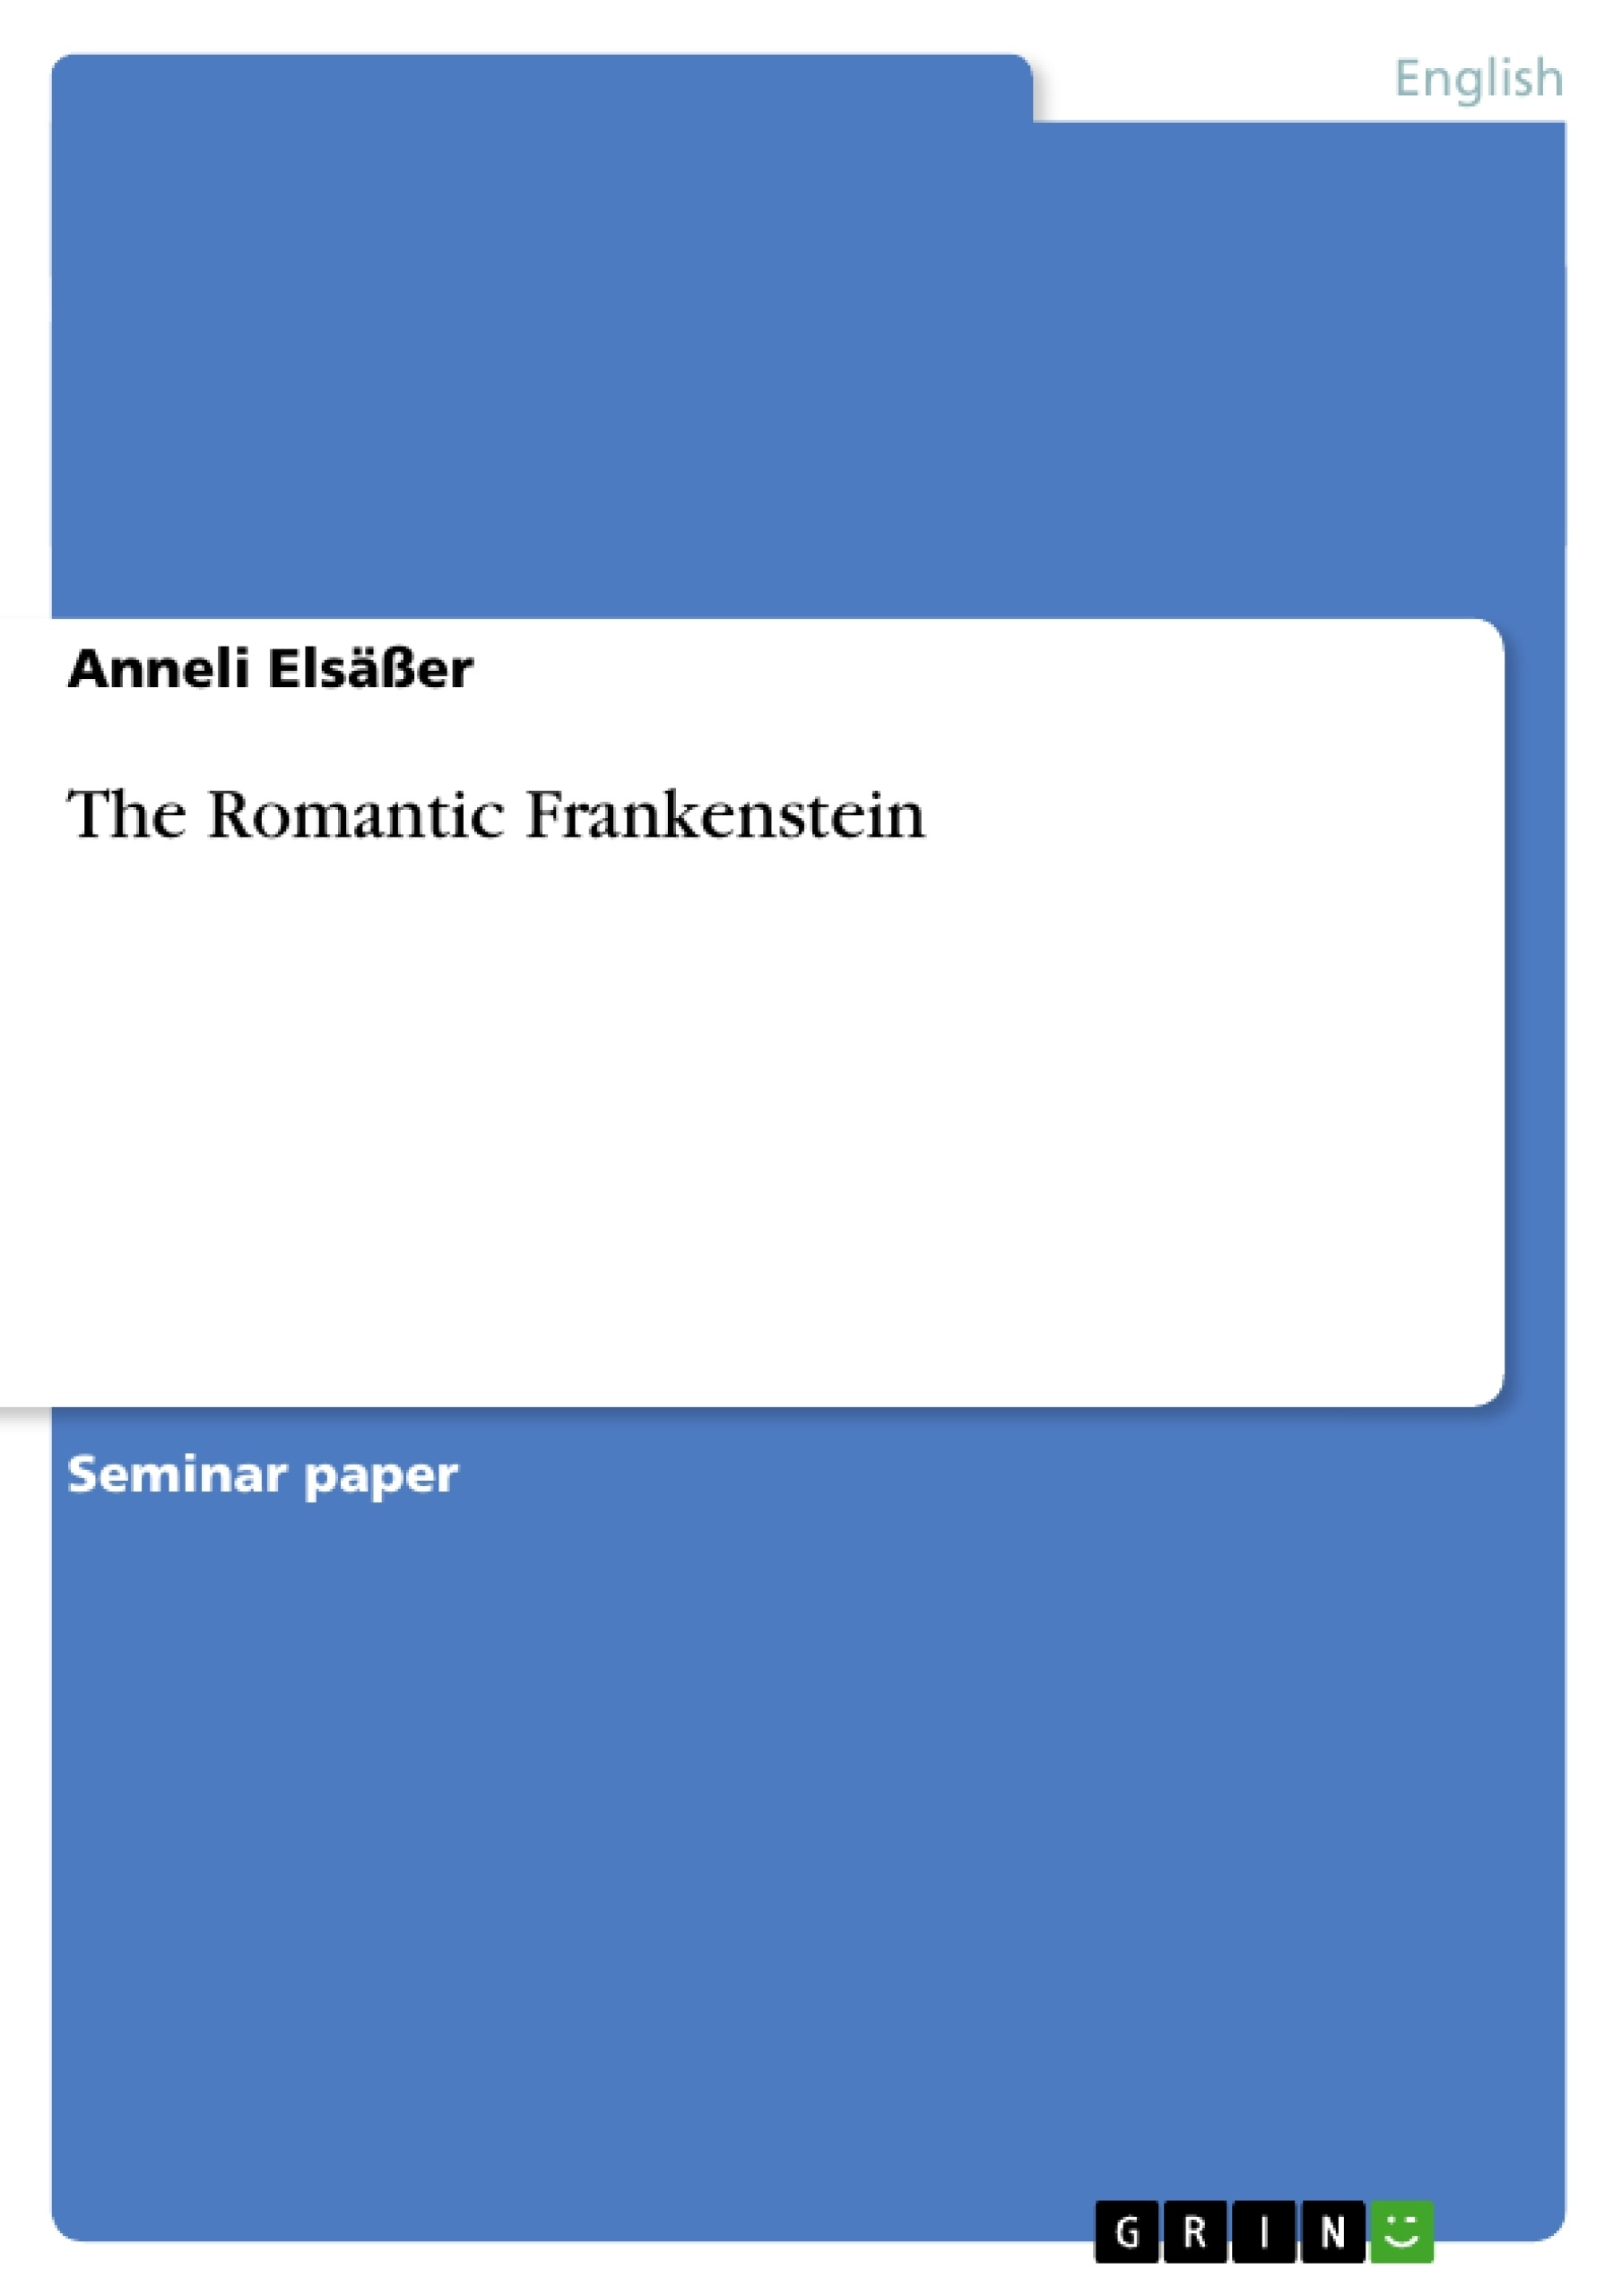 Title: The Romantic Frankenstein